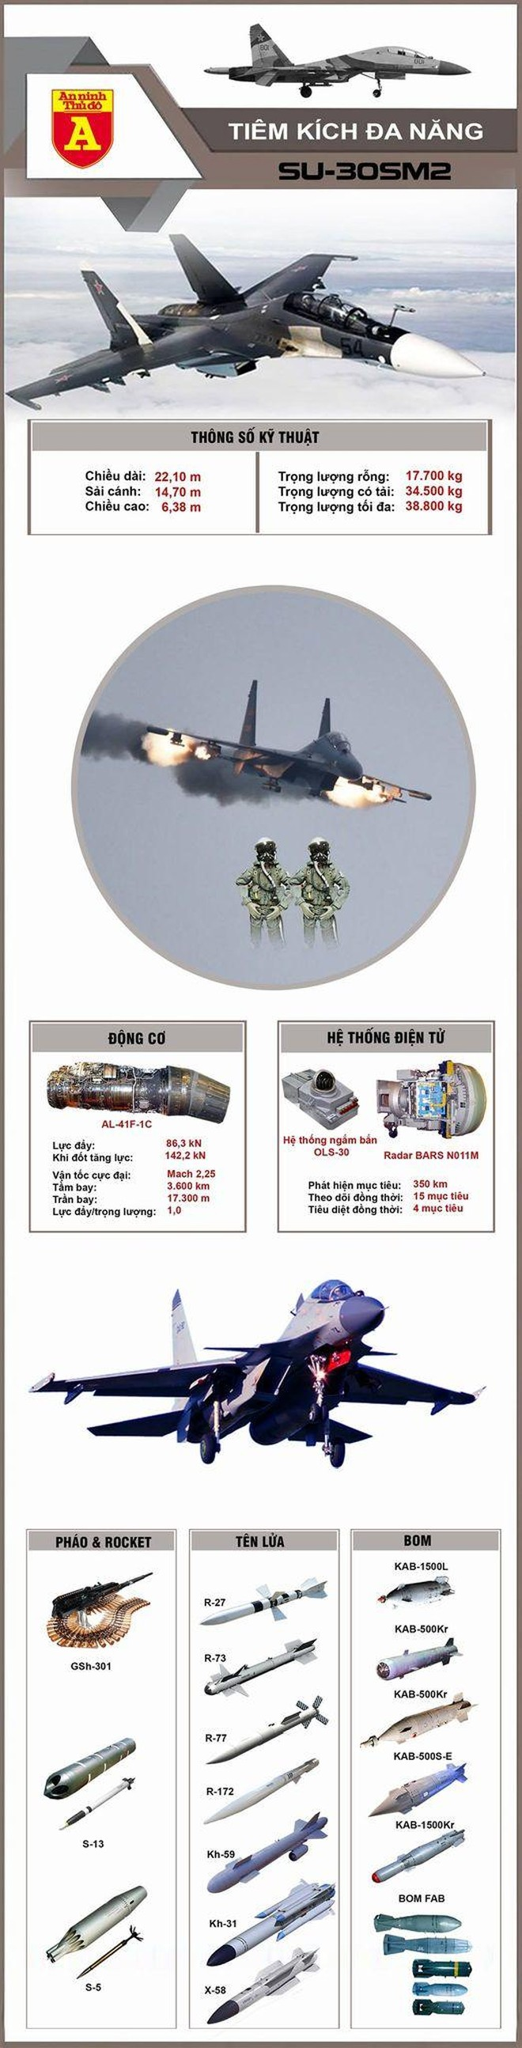 [Info] Su-30SM2 Super Sukhoi, đối thủ của F-15EX Mỹ ảnh 2